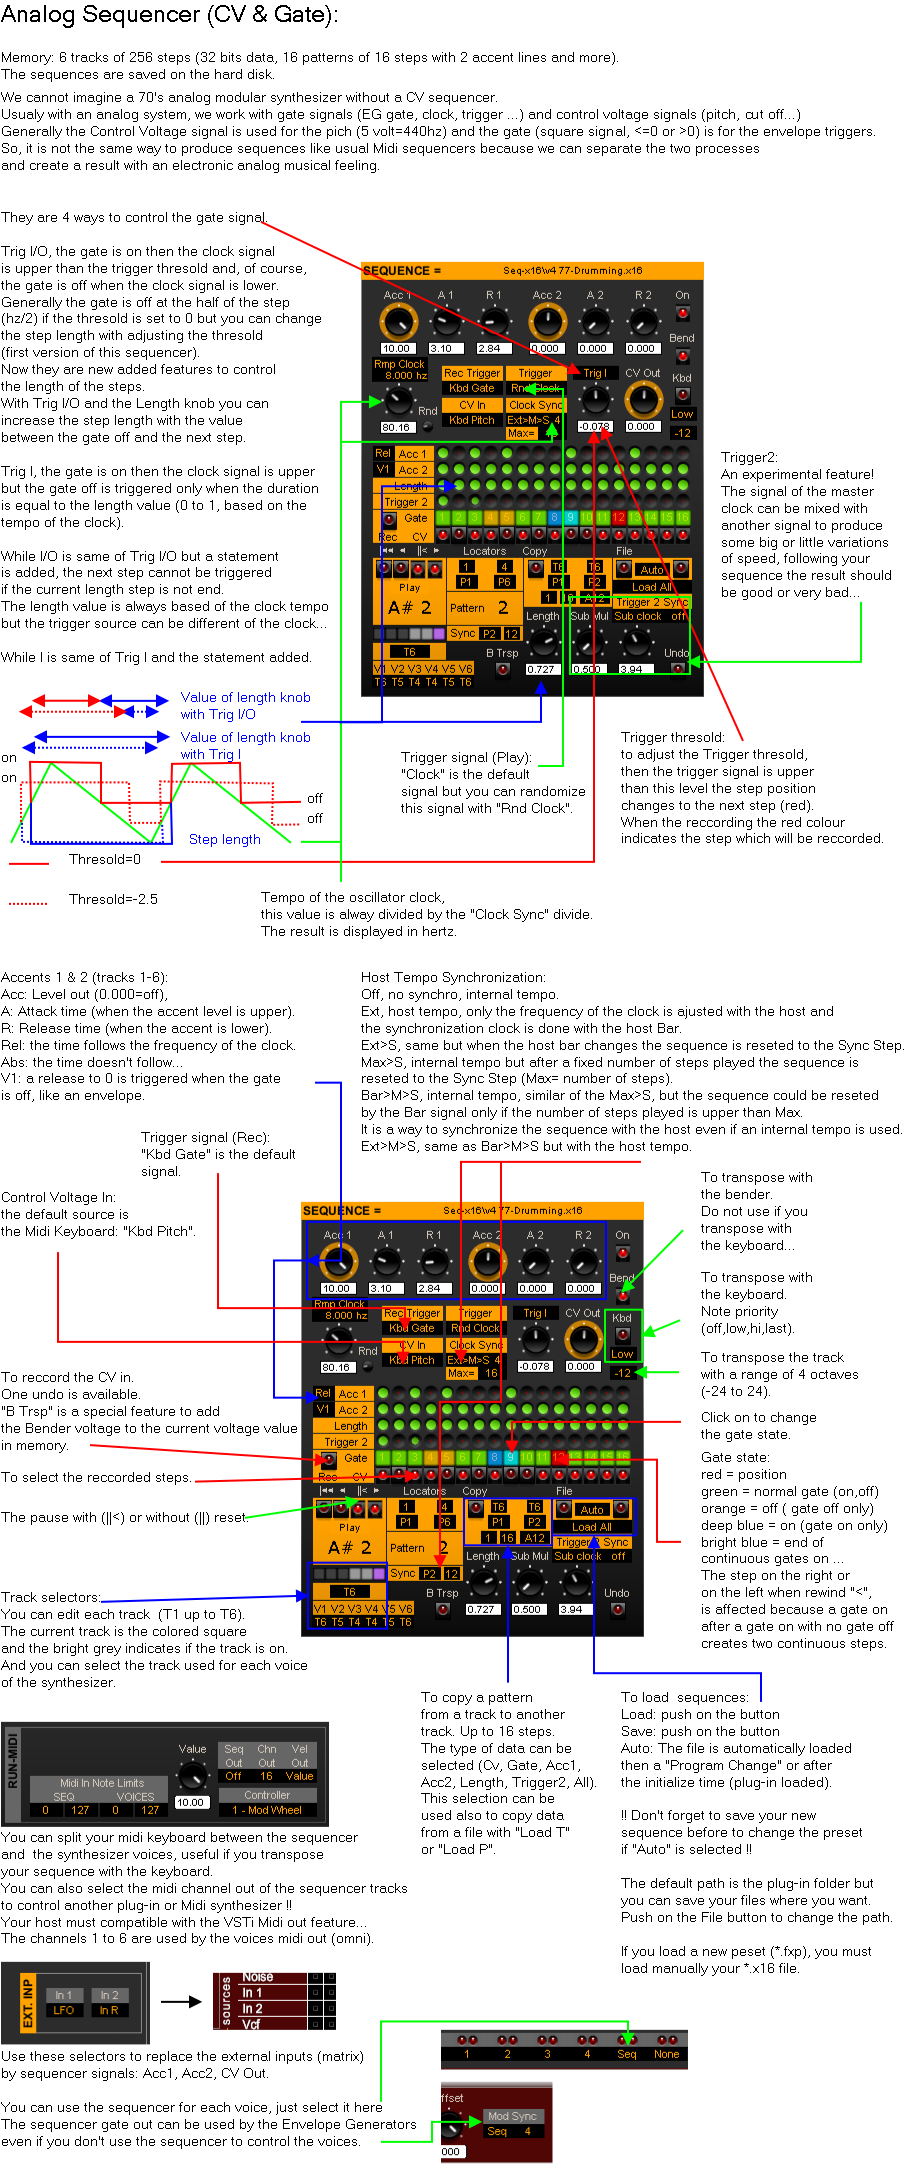 KX-SYNTH-X16 V4 : nouvelle version du séquenceur ! V4%20Seq%20Help